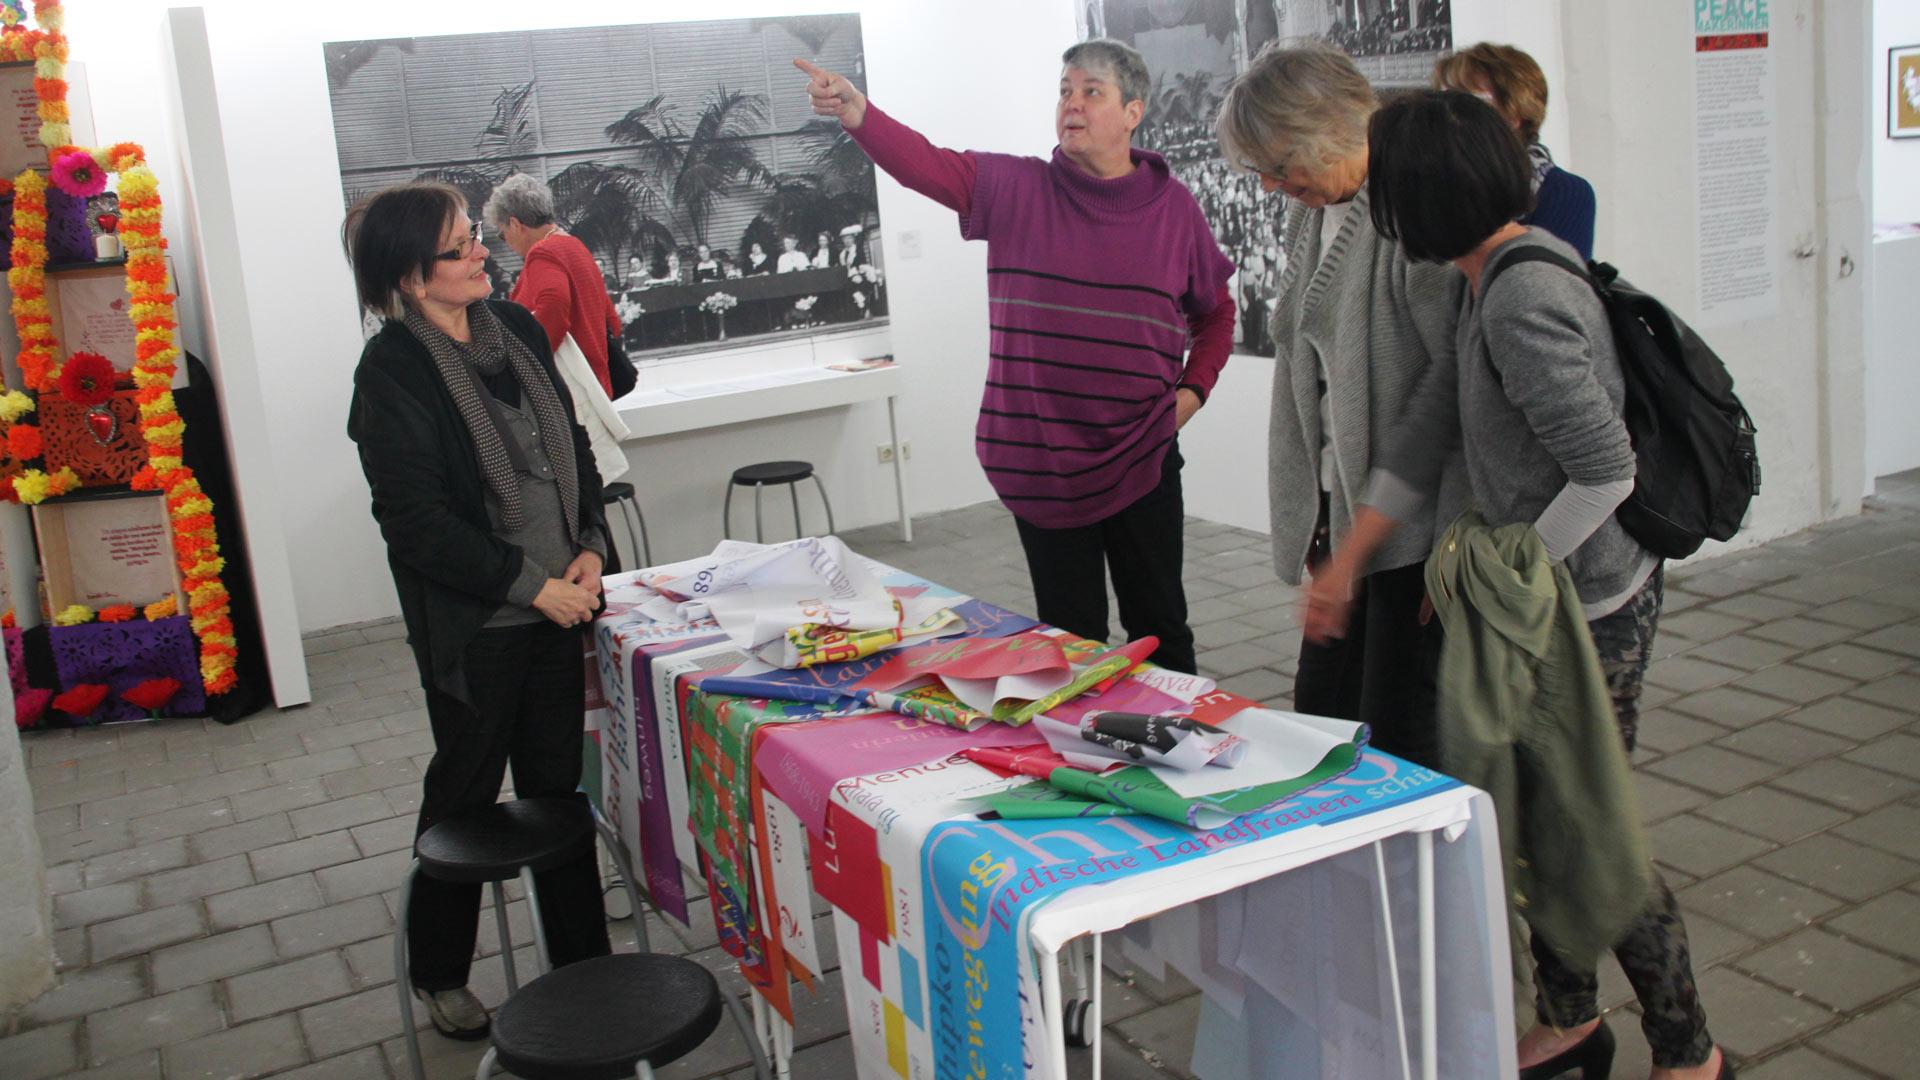 Museum Frauenkultur Regional-International